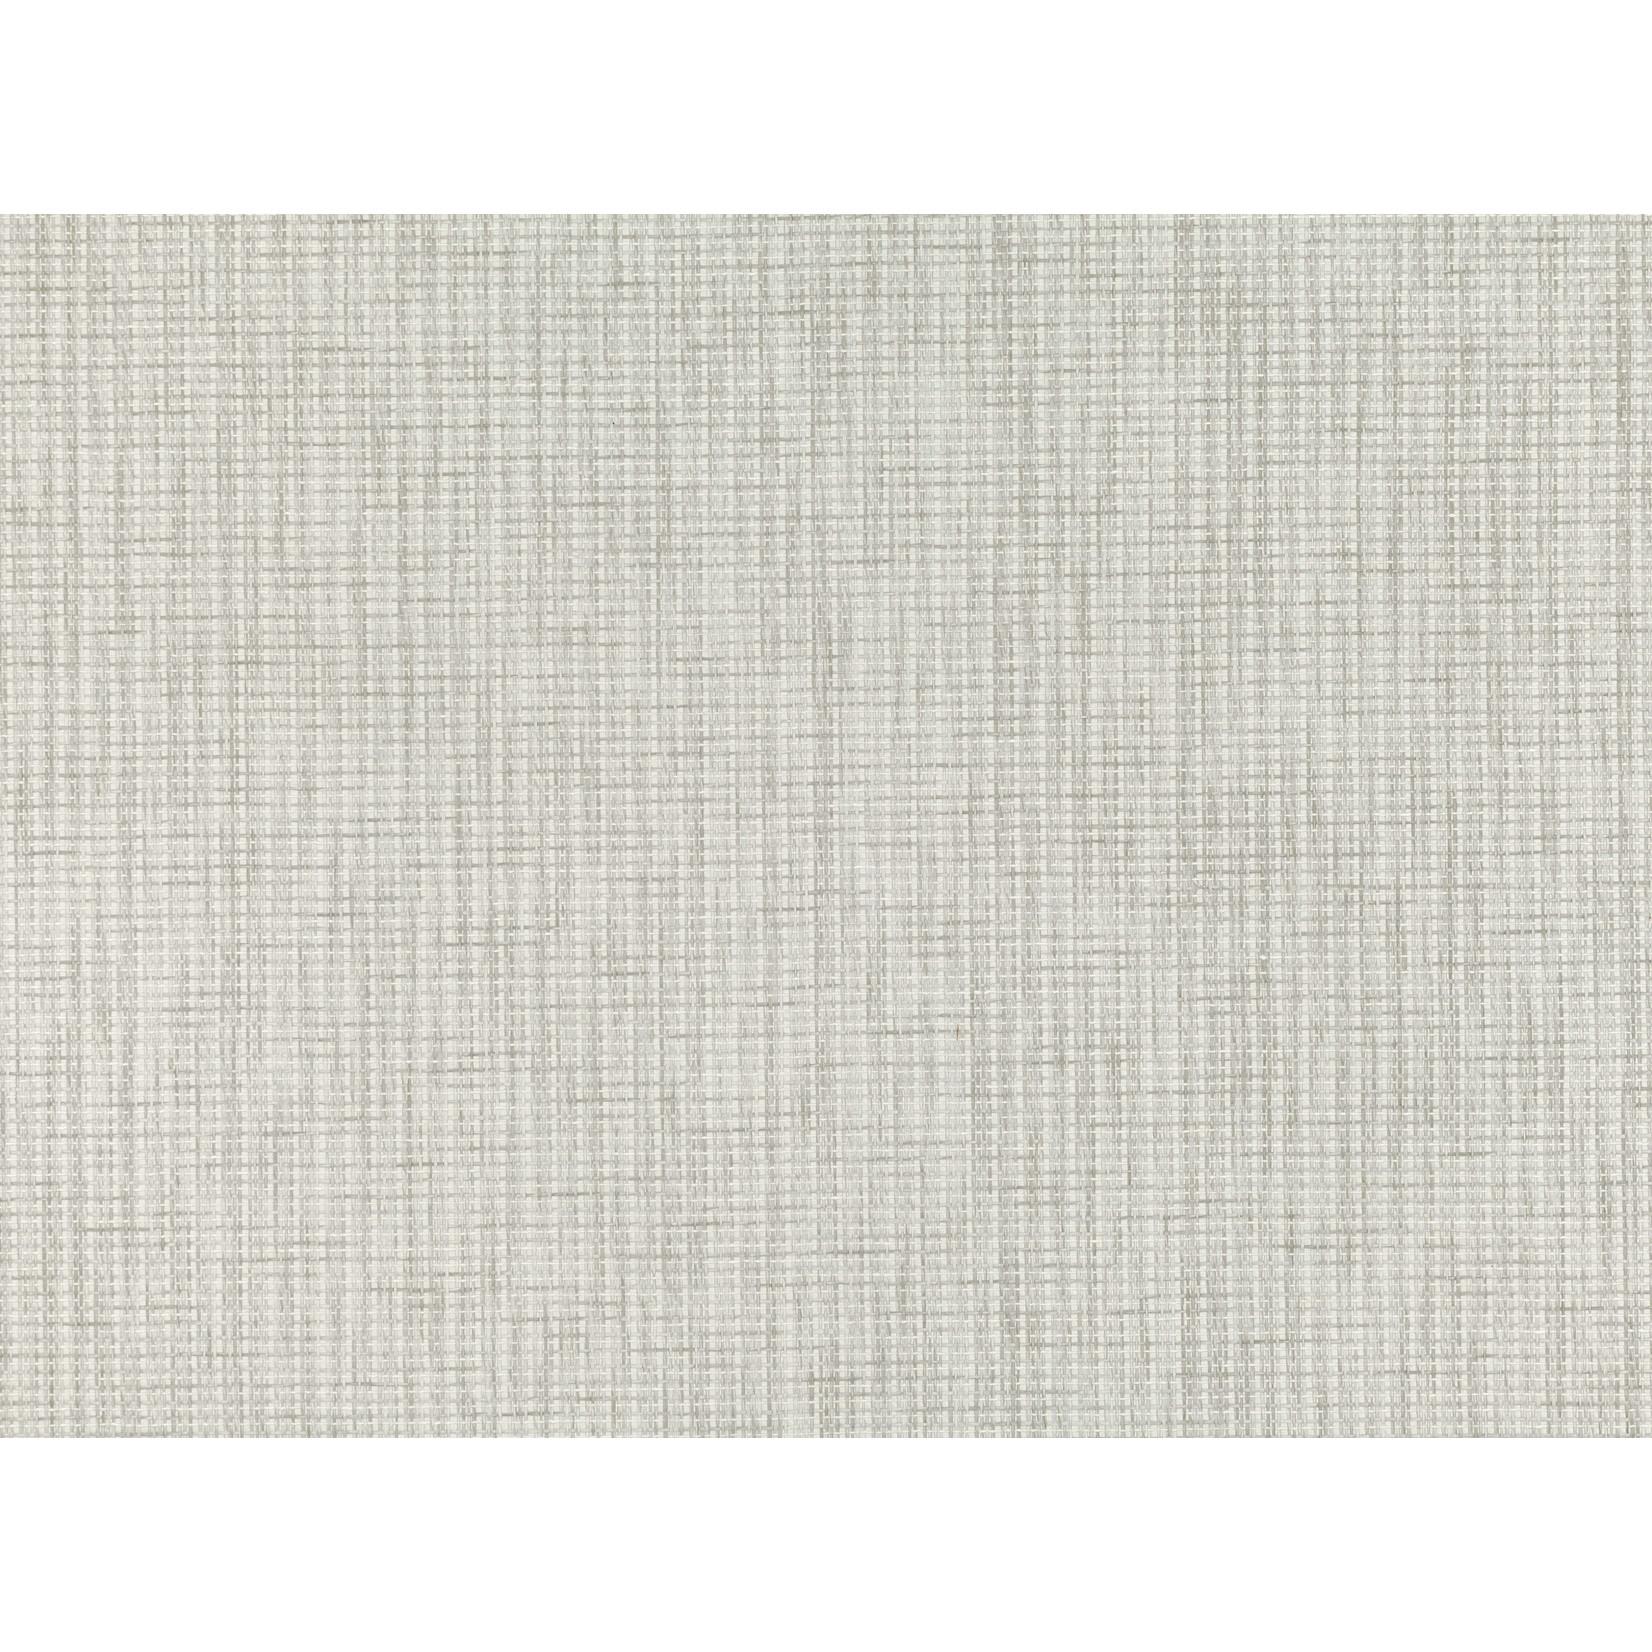 Mark Alexander Paperweave Handwoven Wallcoverings | Kami Powder